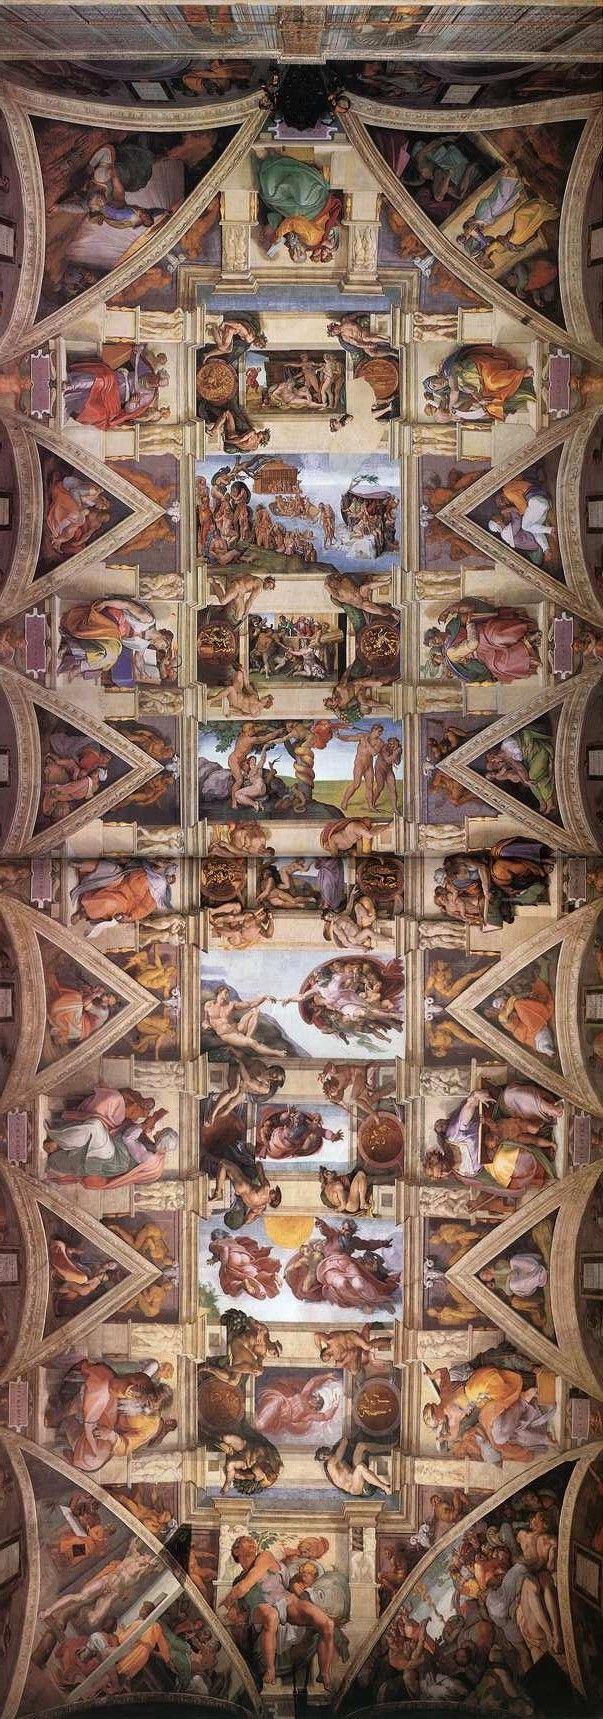 Michelangelo Buonarroti 1475-1564  / システィ-ナ礼拝堂天上画 1508-1512 システィ-ナ礼拝堂(バチカン)